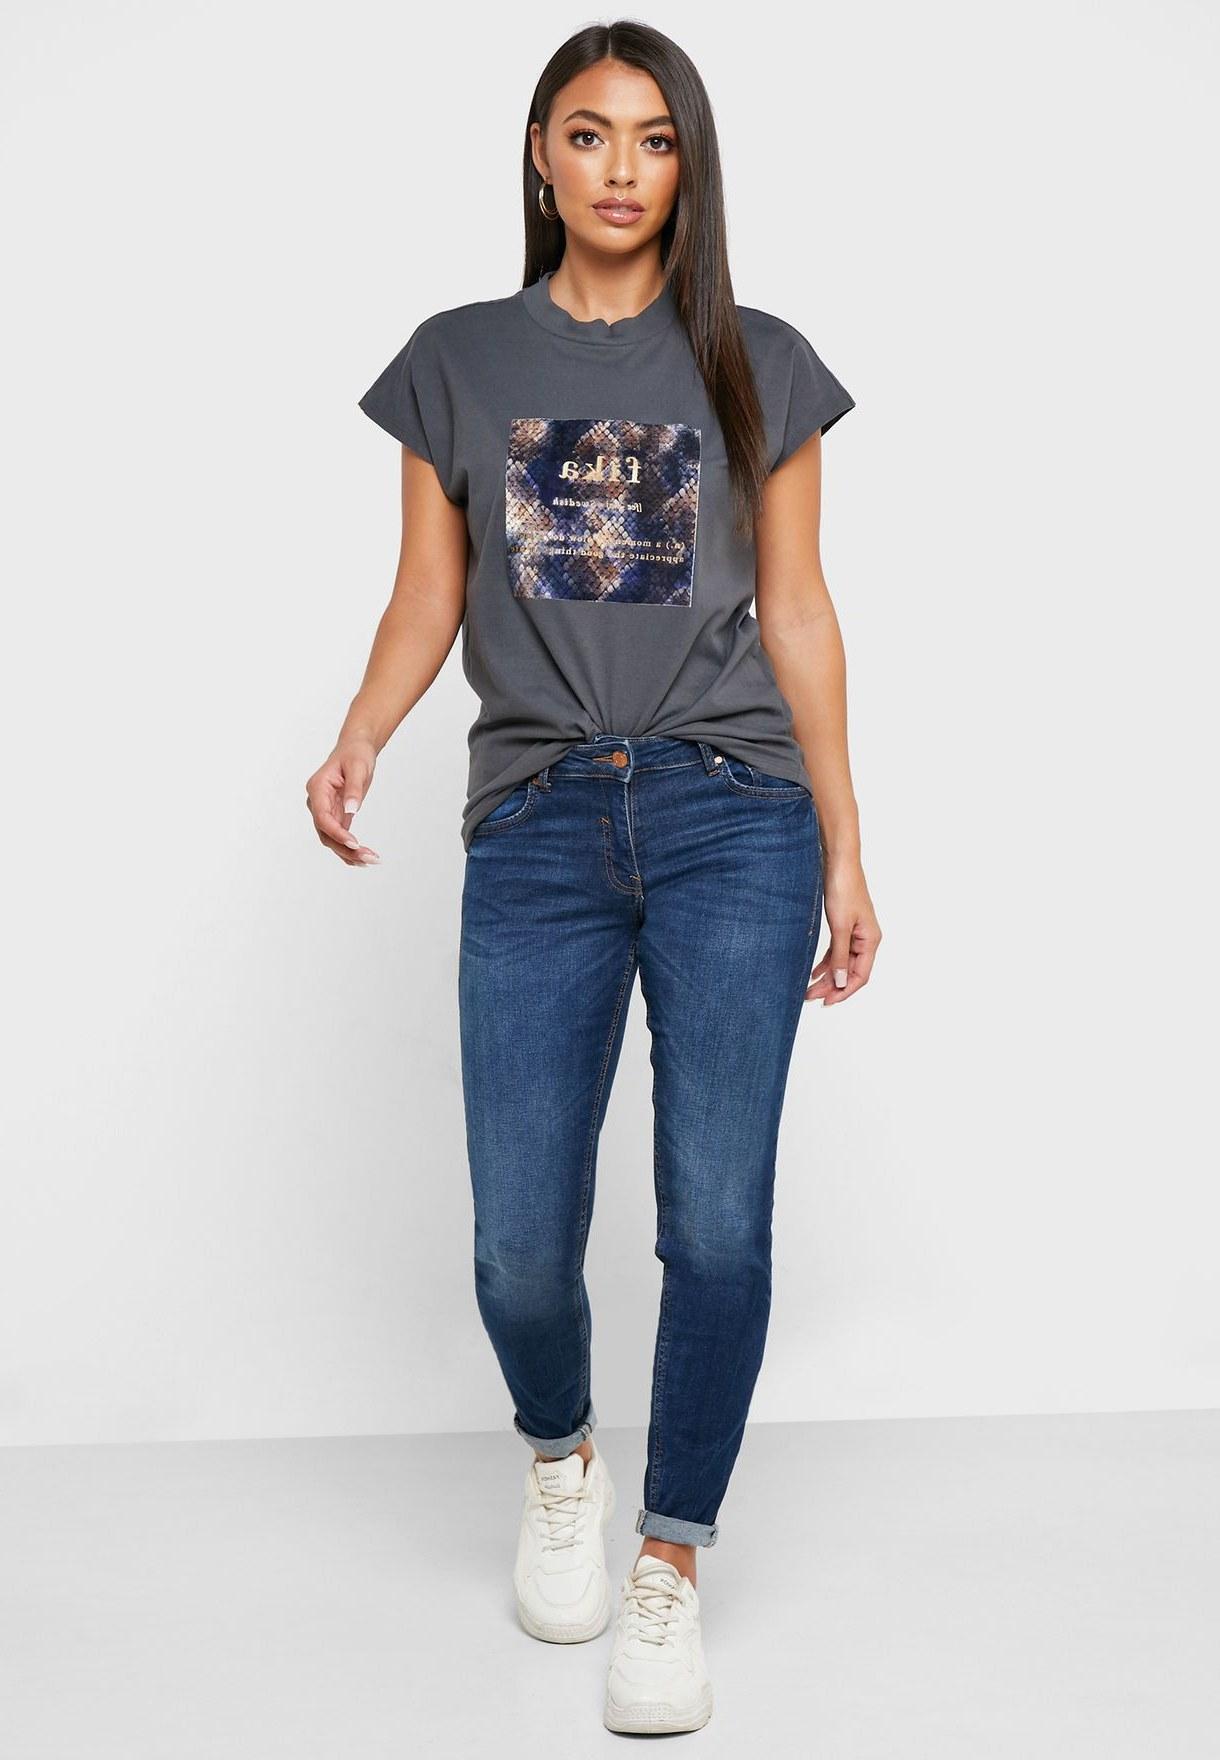 Model Model Bridesmaid Hijab 2019 4pde Crew Neck Graphic T Shirt